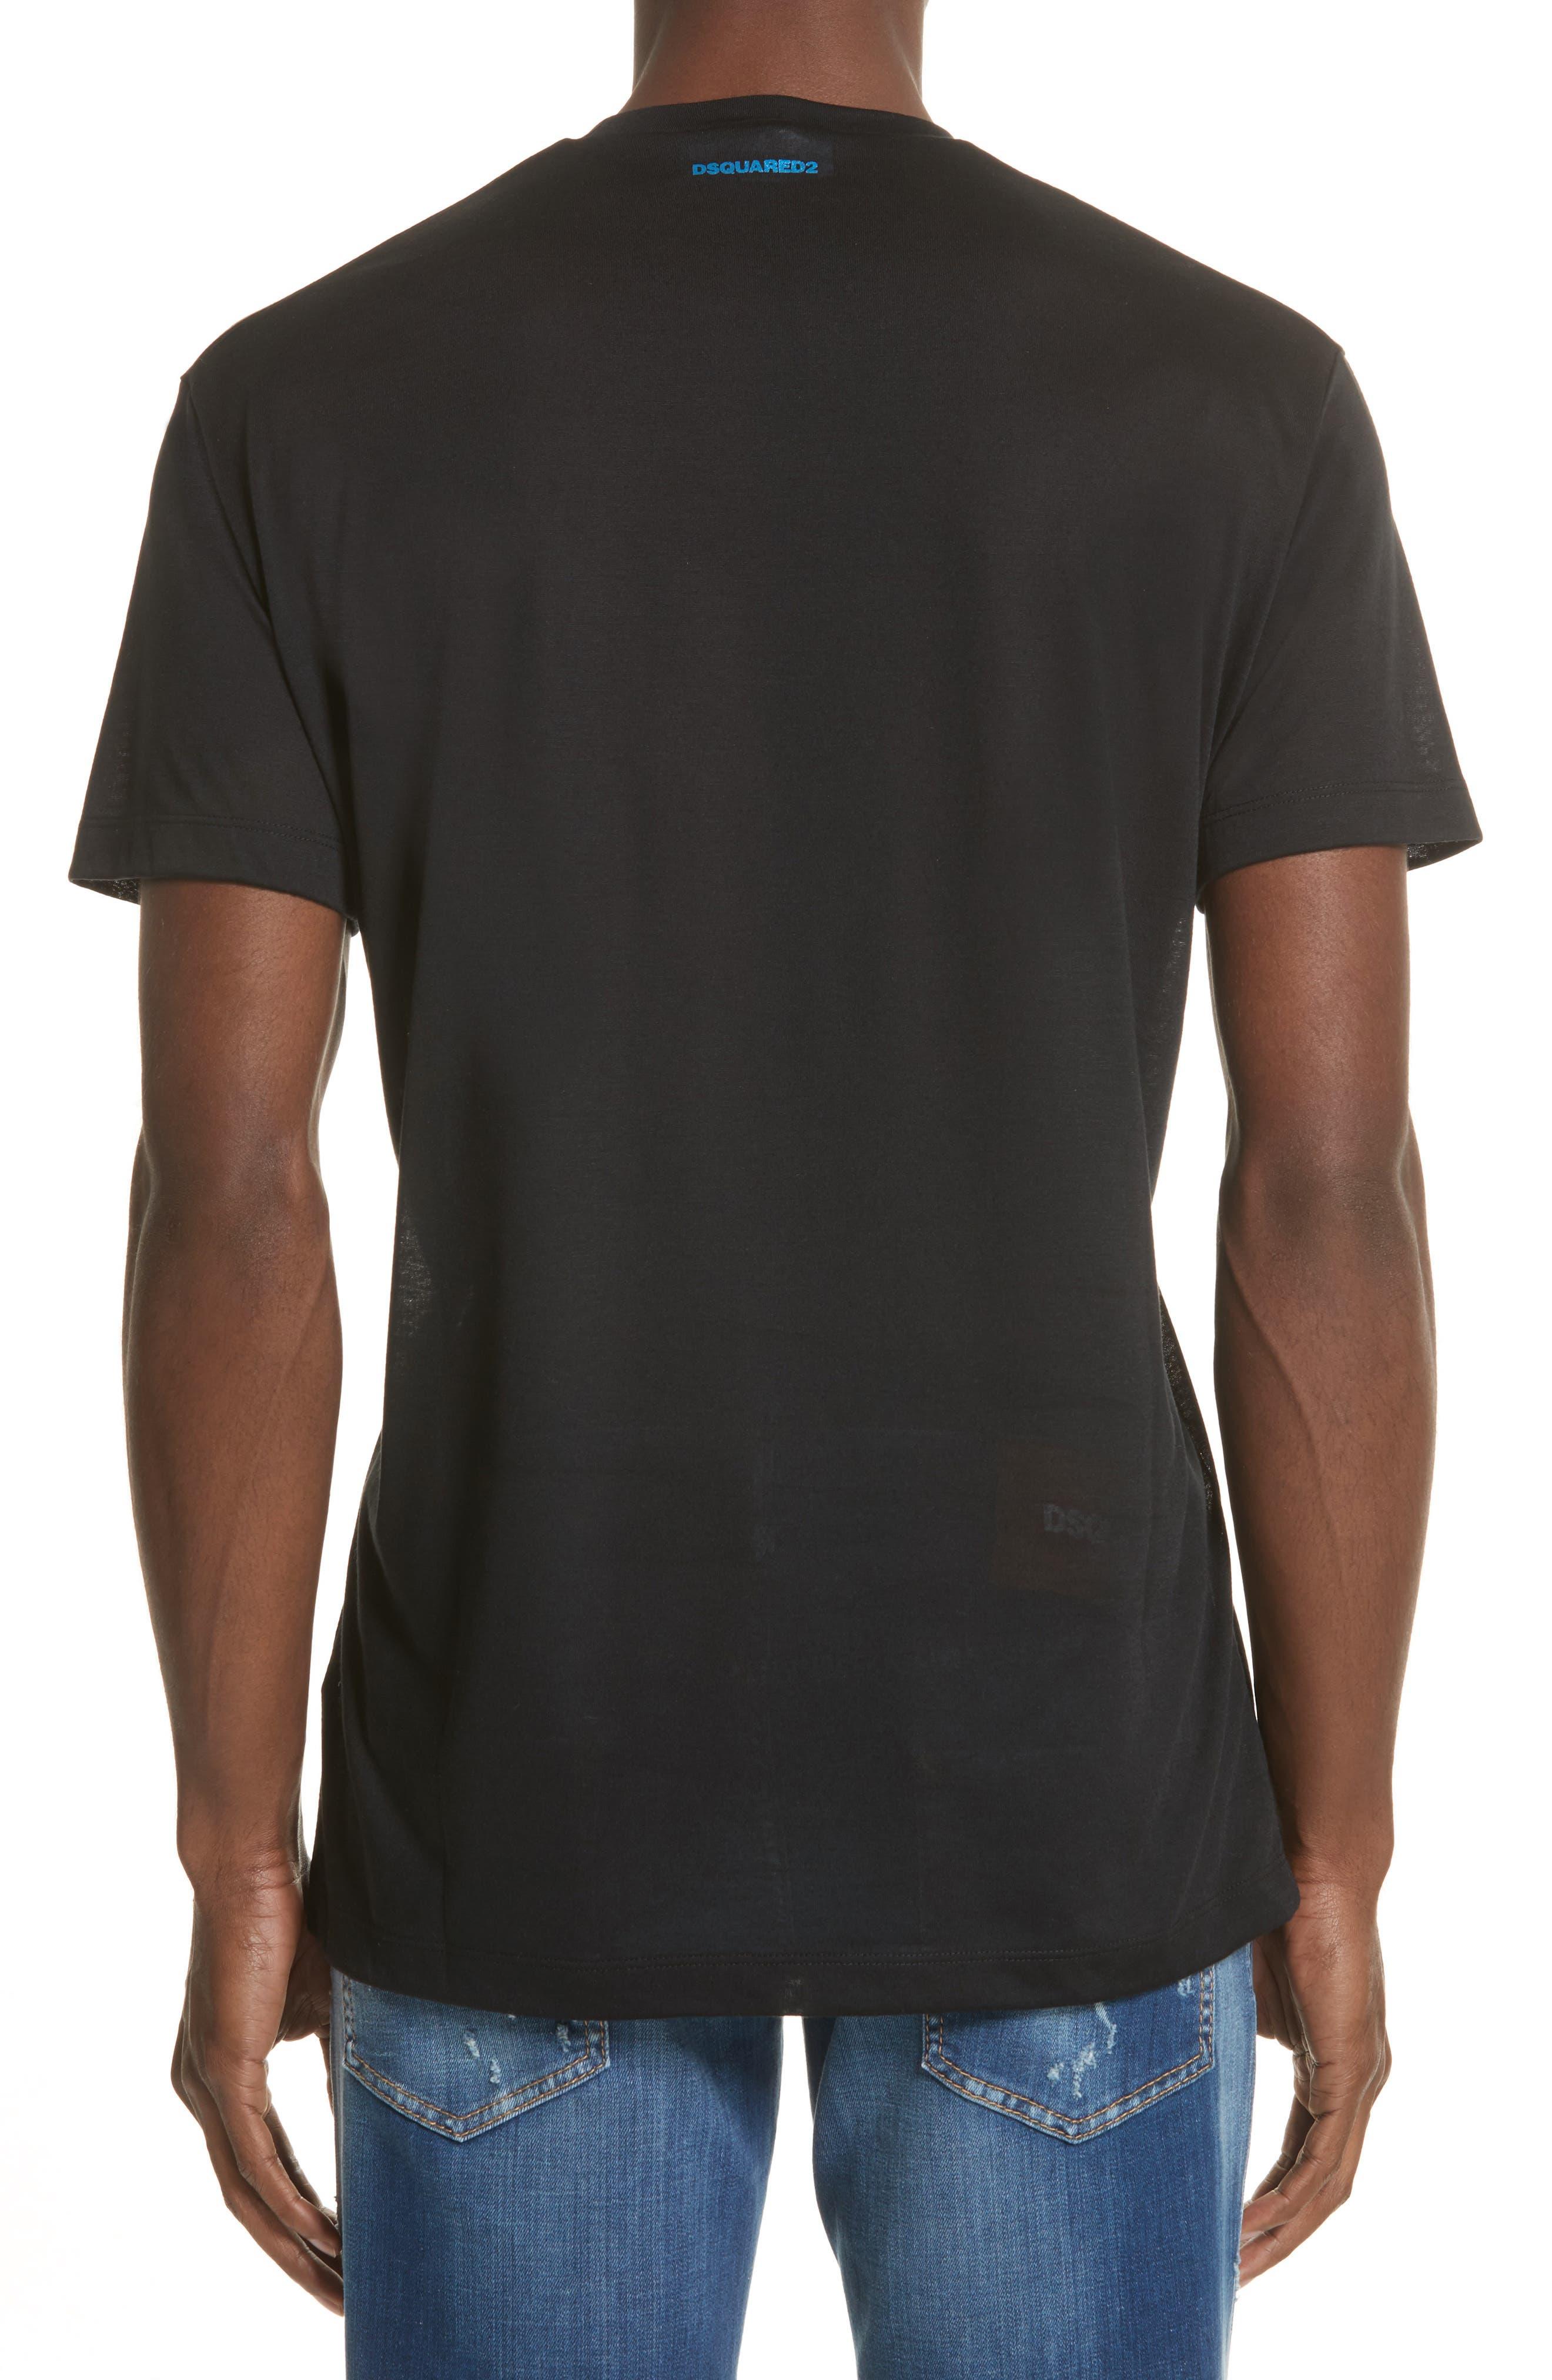 City of Stars Graphic T-Shirt,                             Alternate thumbnail 2, color,                             Black